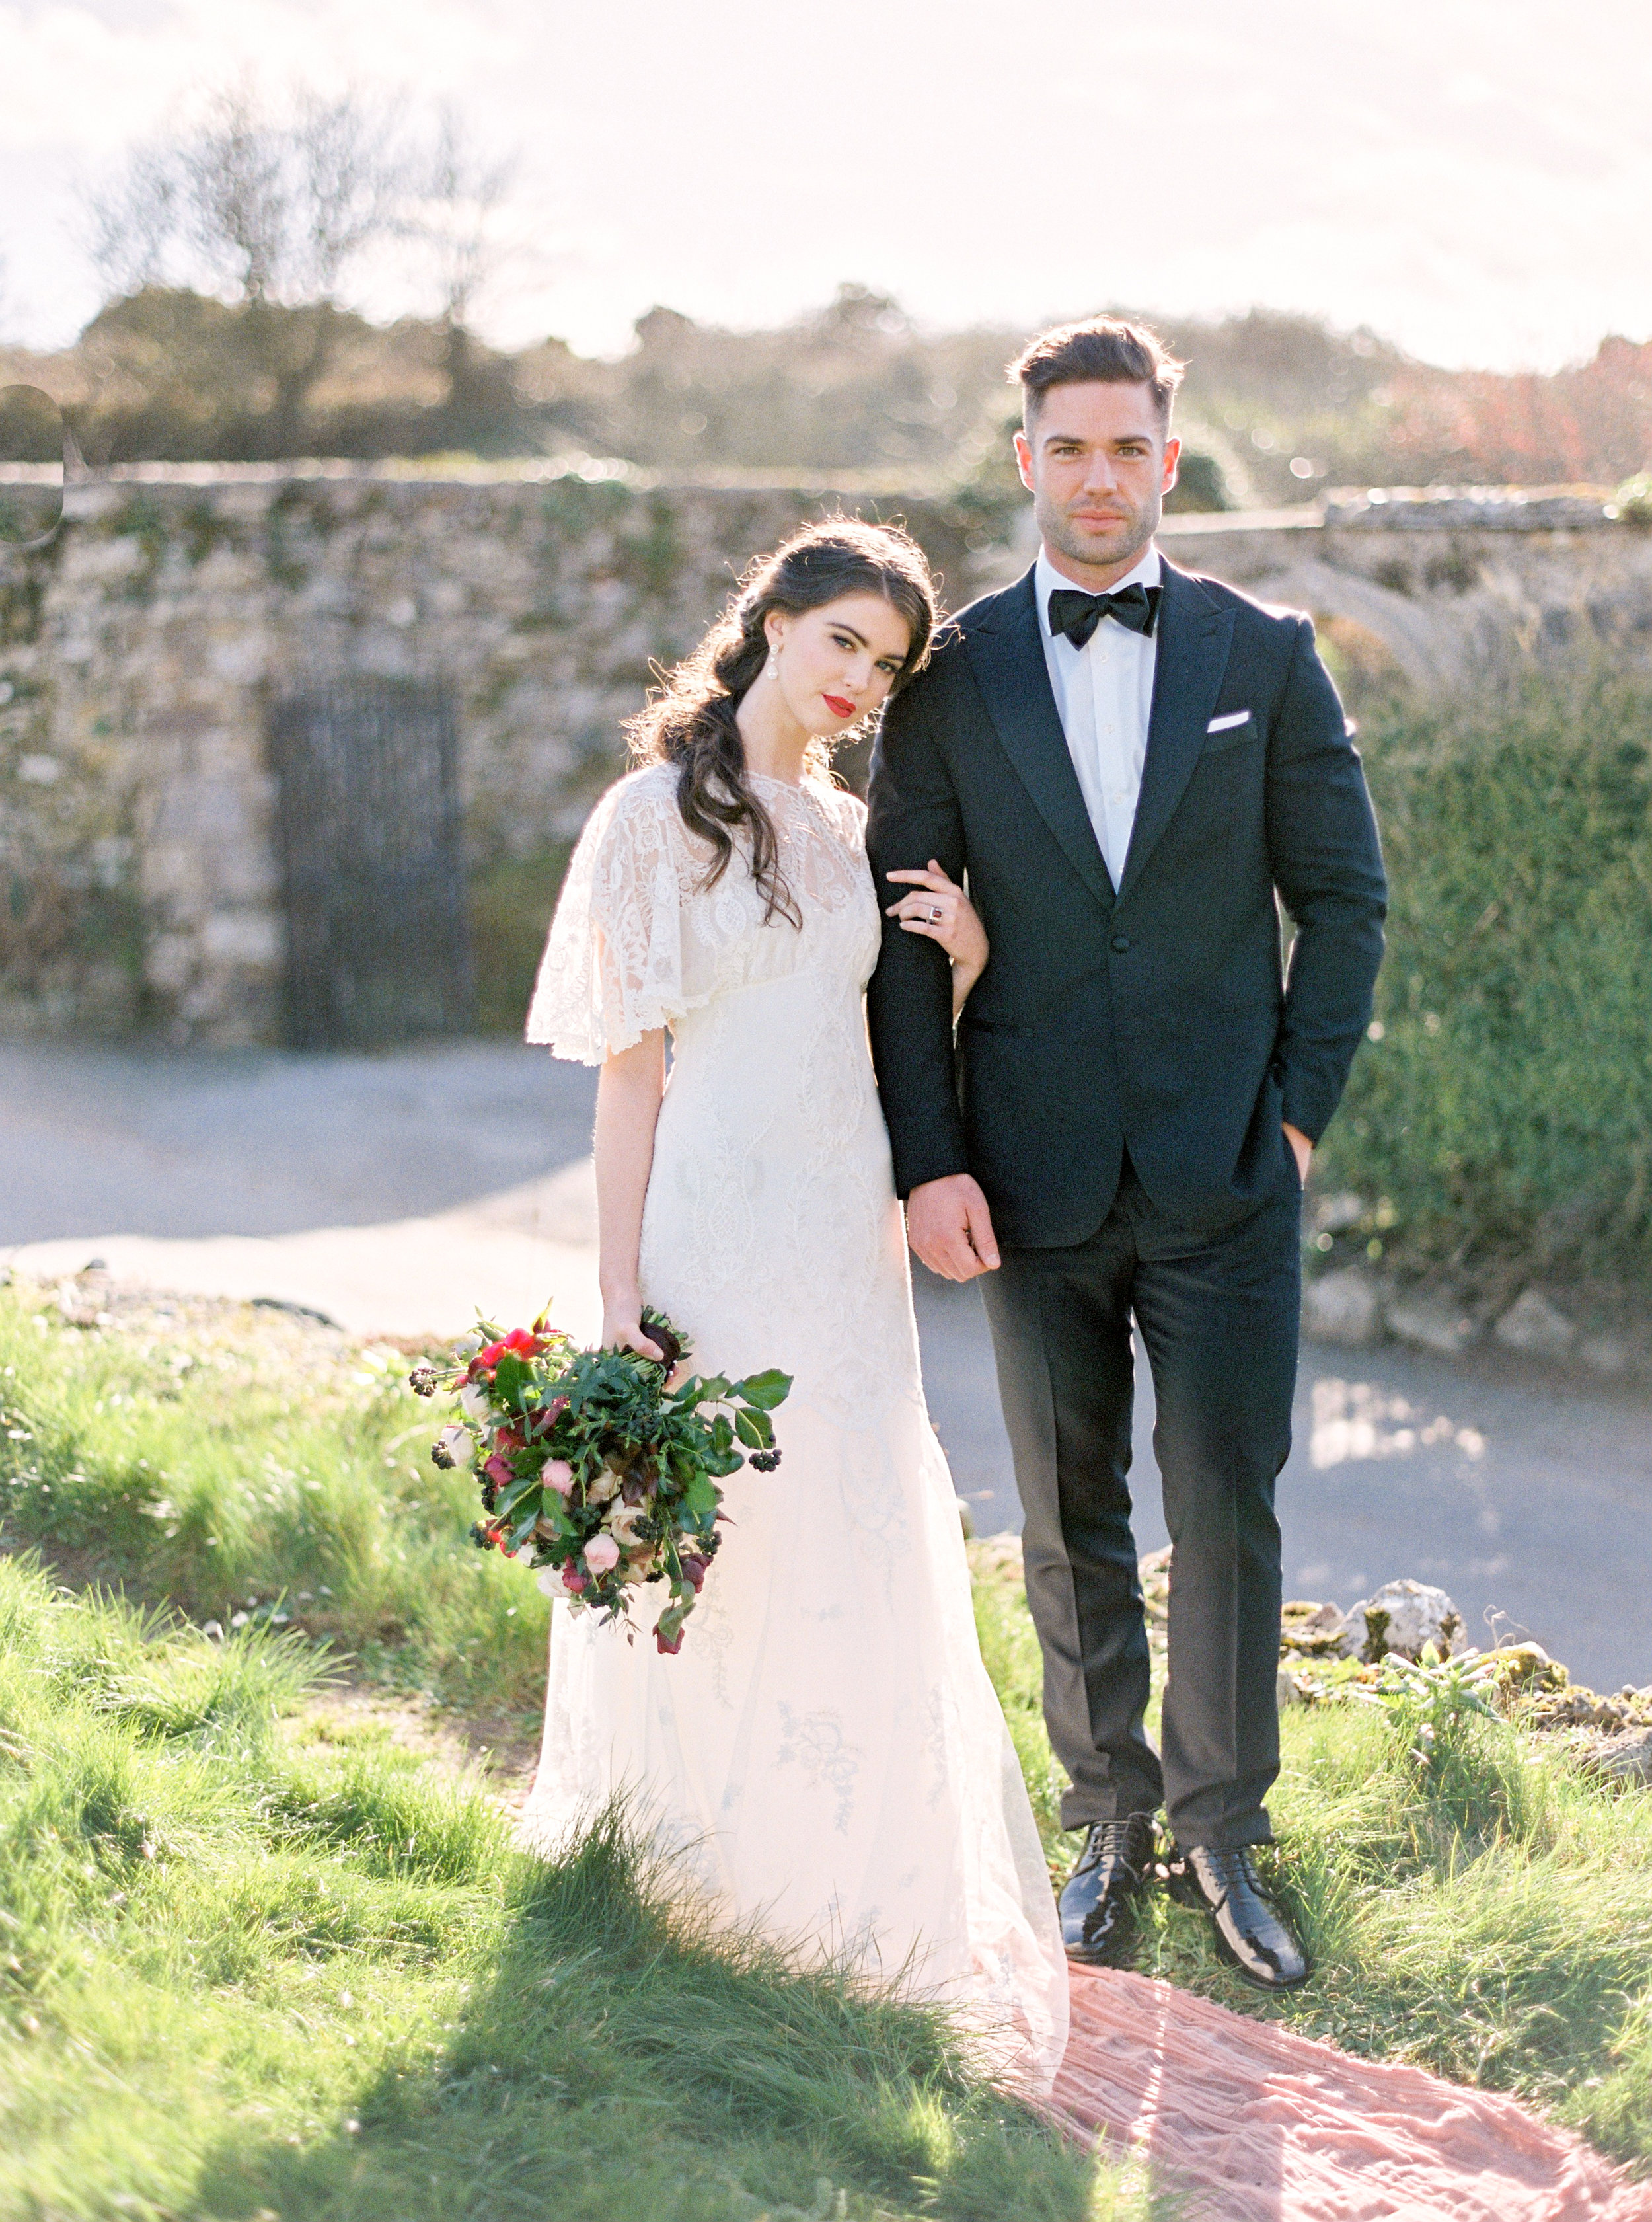 Irish Countryside Wedding | Amelia Johnson Photography | Pamela Barefoot Events + Design | Joy Wed | Fine Art Wedding Blog | Canadian Wedding Blog | Stacey Foley Design | Canmore Wedding Planner